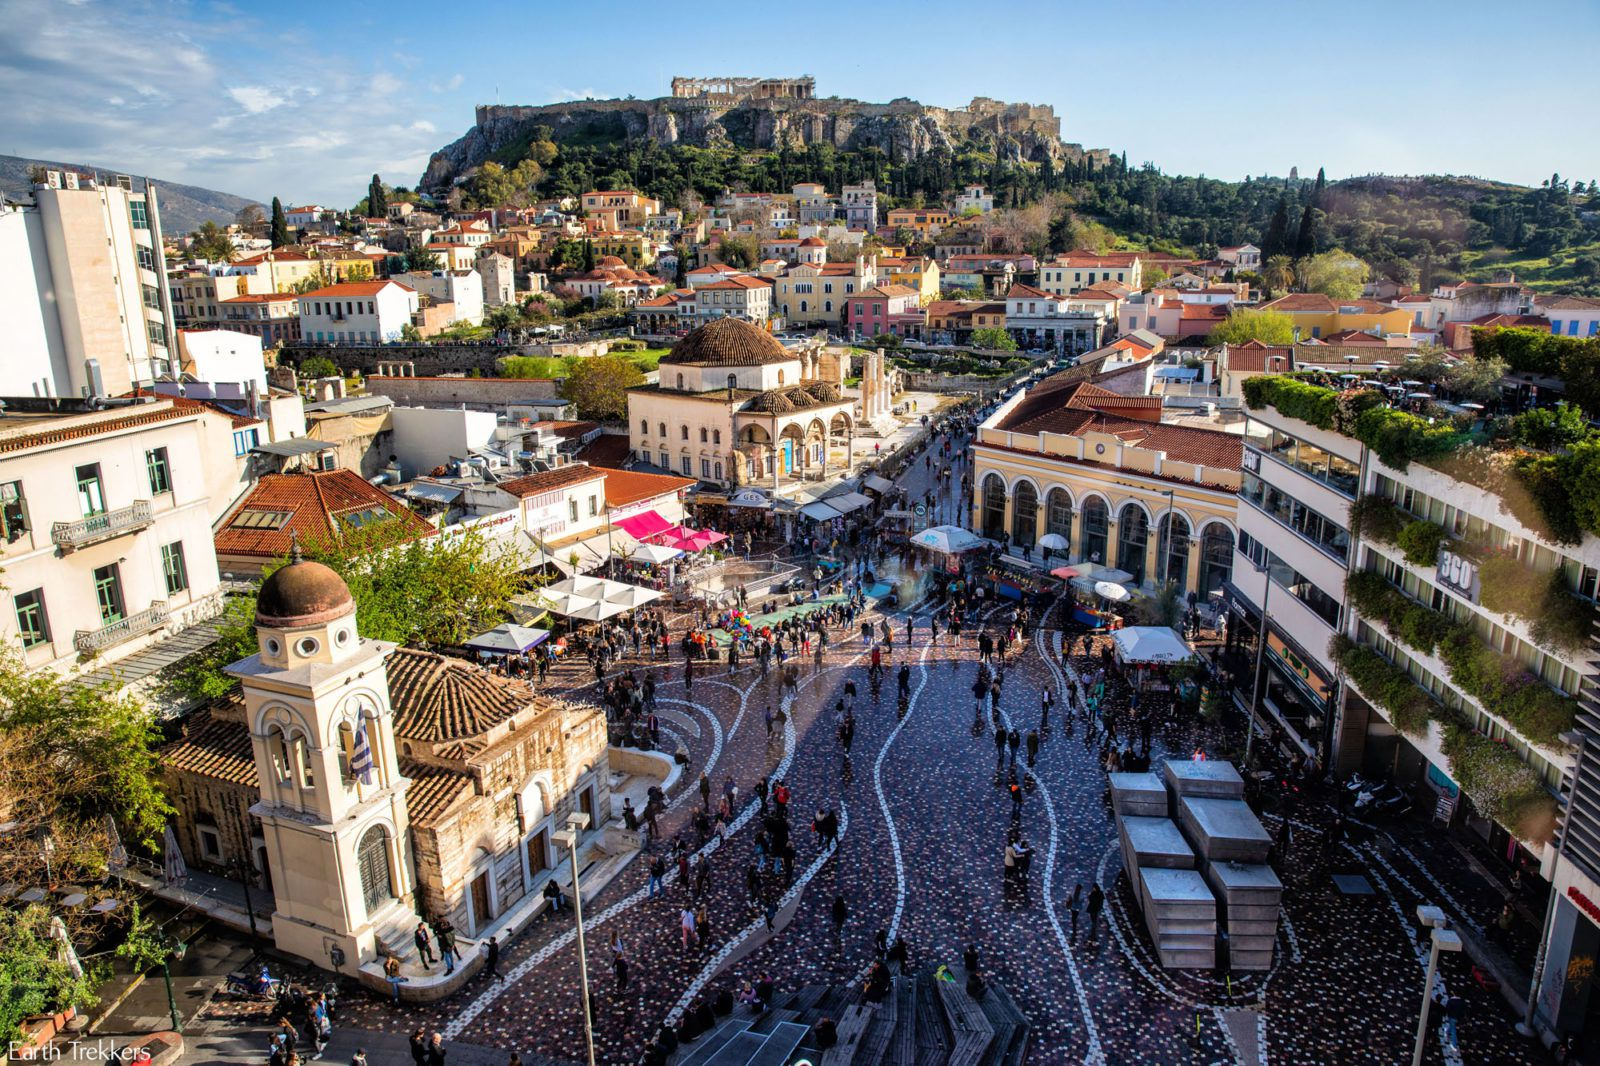 Best Views of the Acropolis